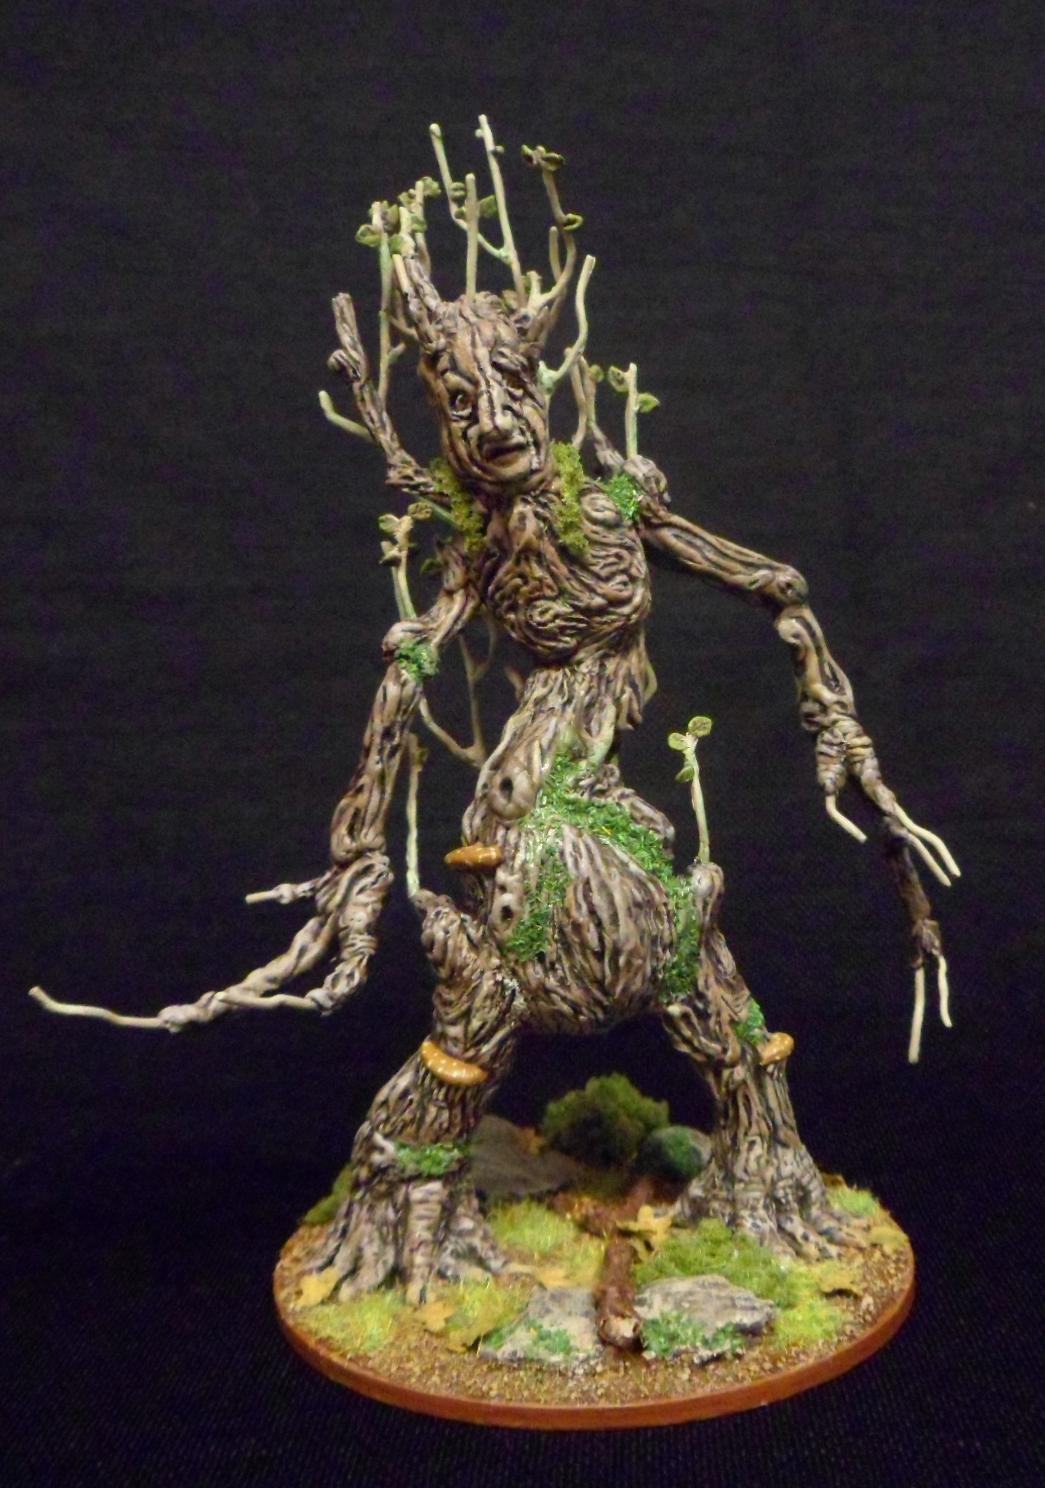 Linden Tree Giant